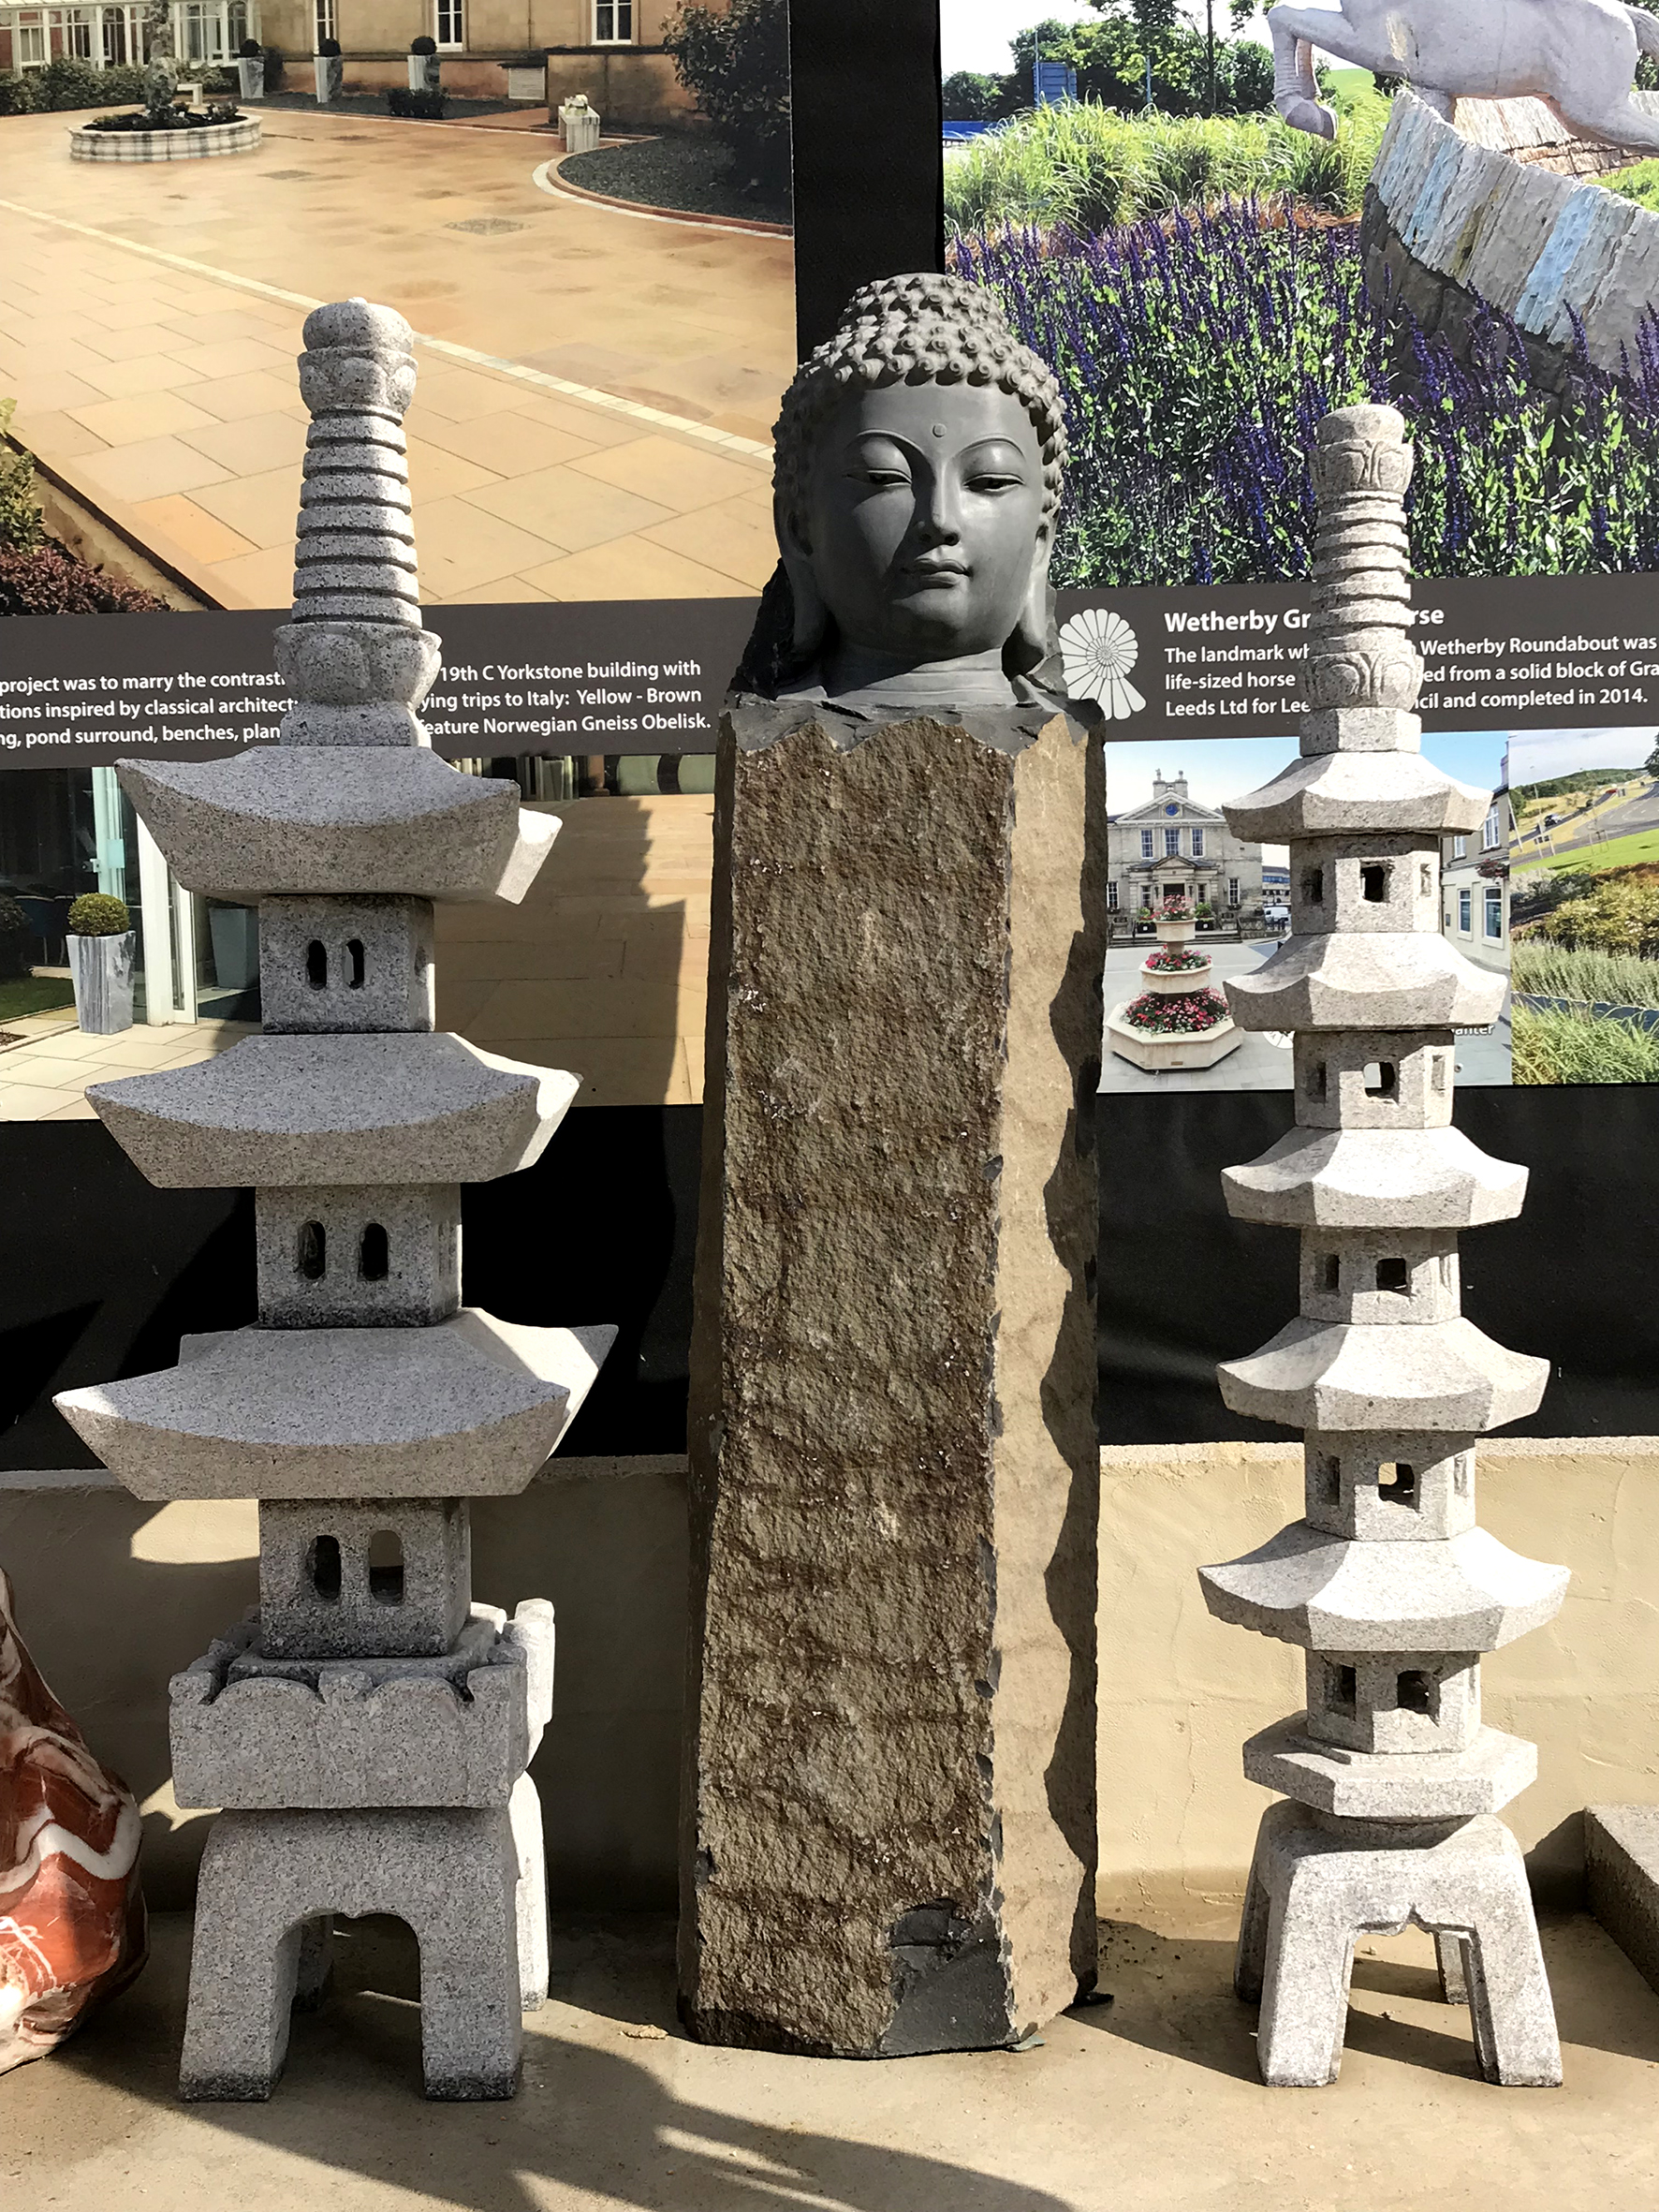 Go Ju Tou and Nara Lanterns